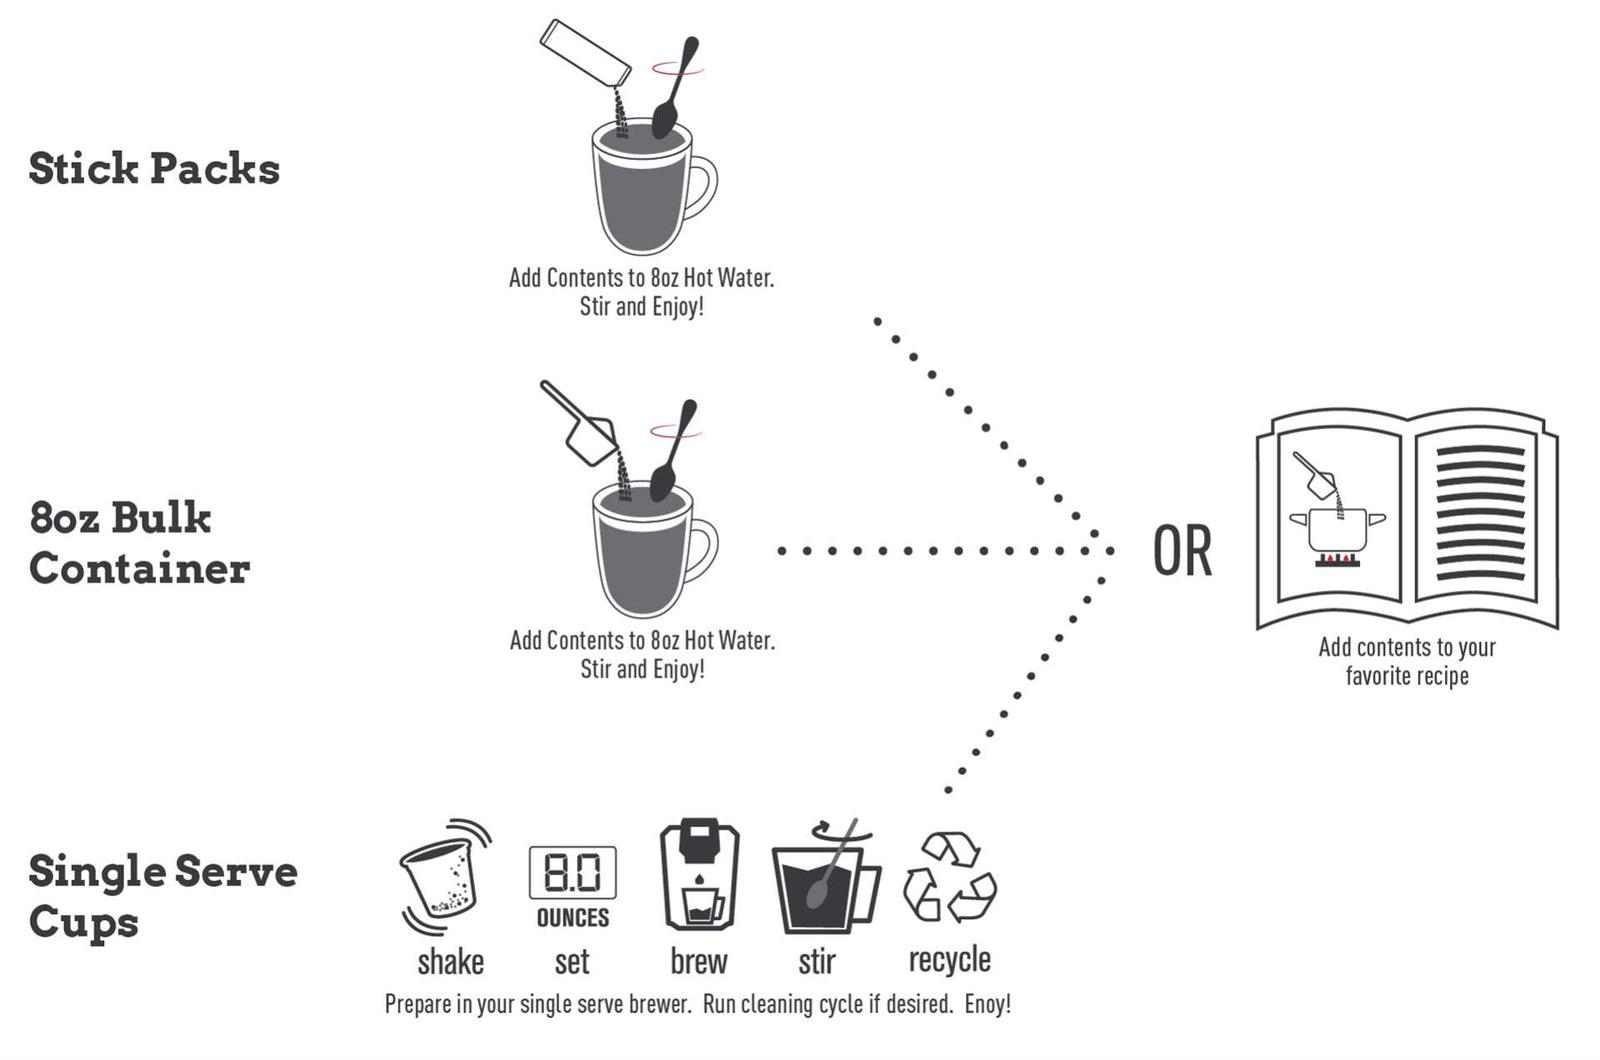 master cleanse lemonade diet instructions